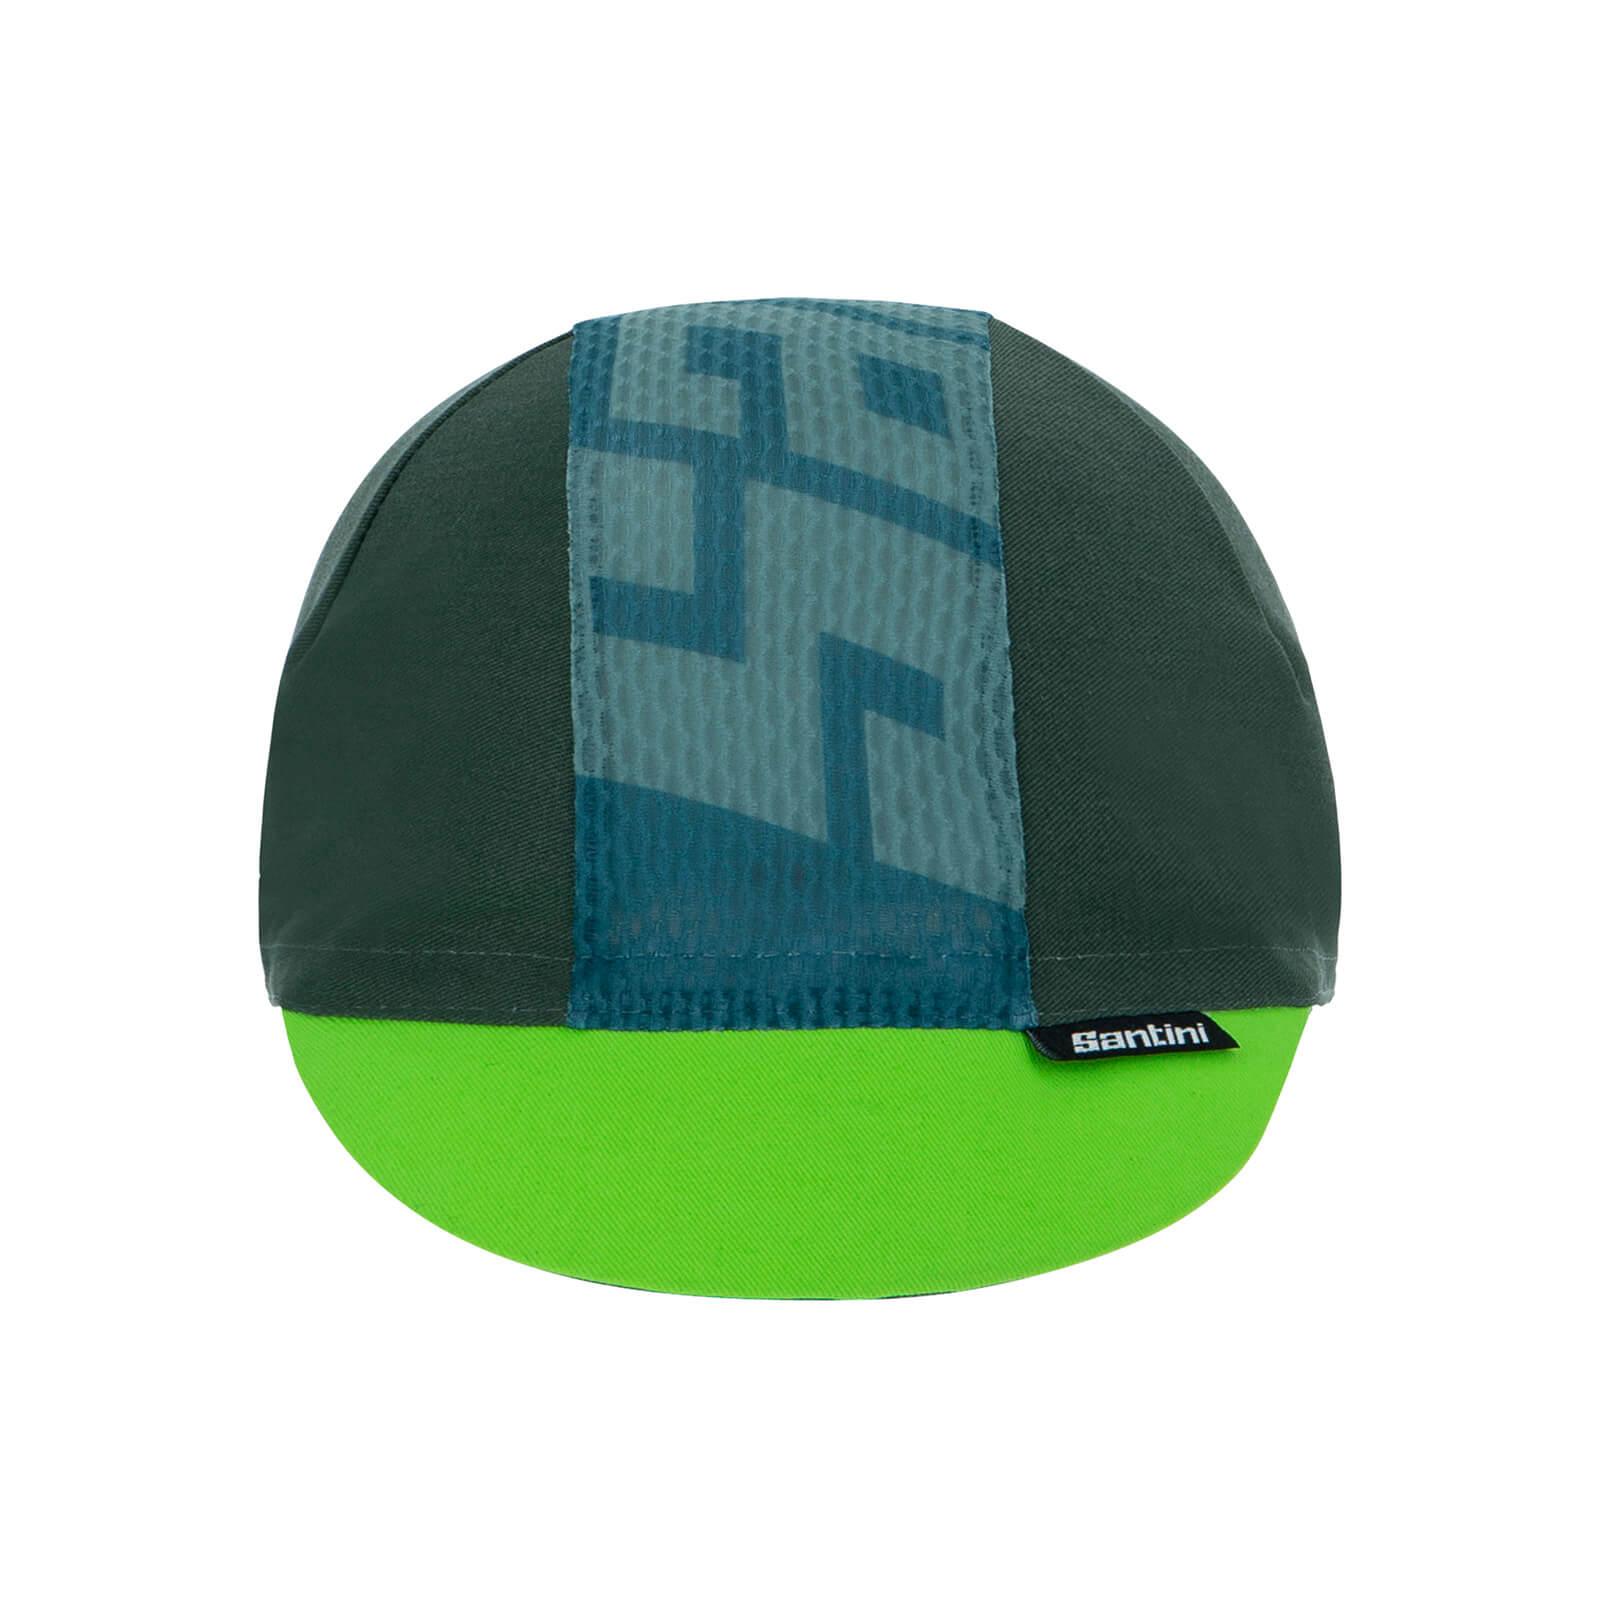 Santini Colore Cotton Cycling Cap - Military Green